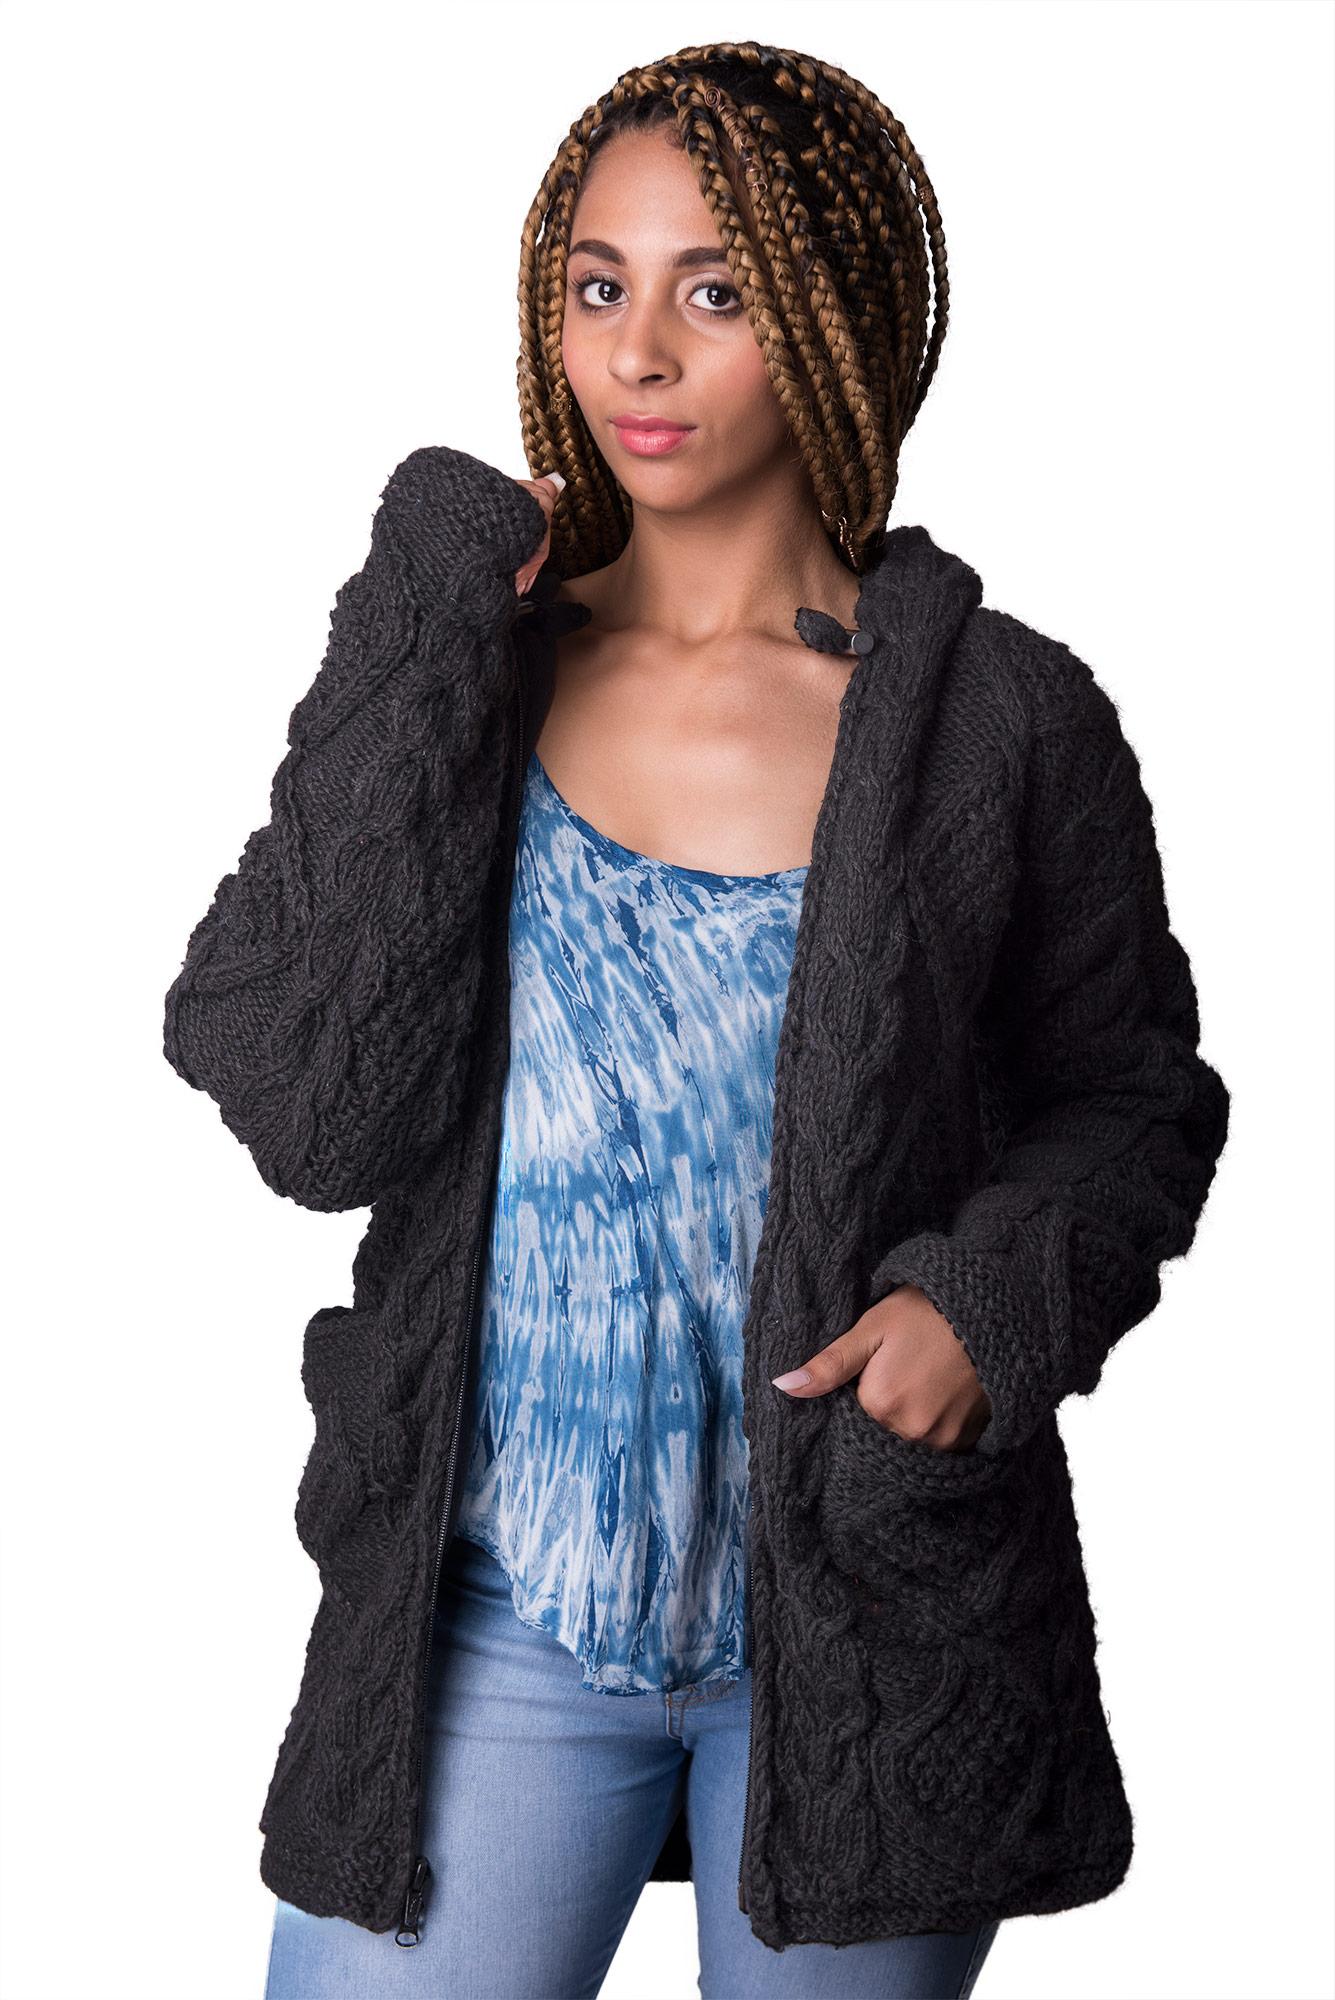 Wool Cable Knit Himalayan Mountain Jacket – Long Length Black